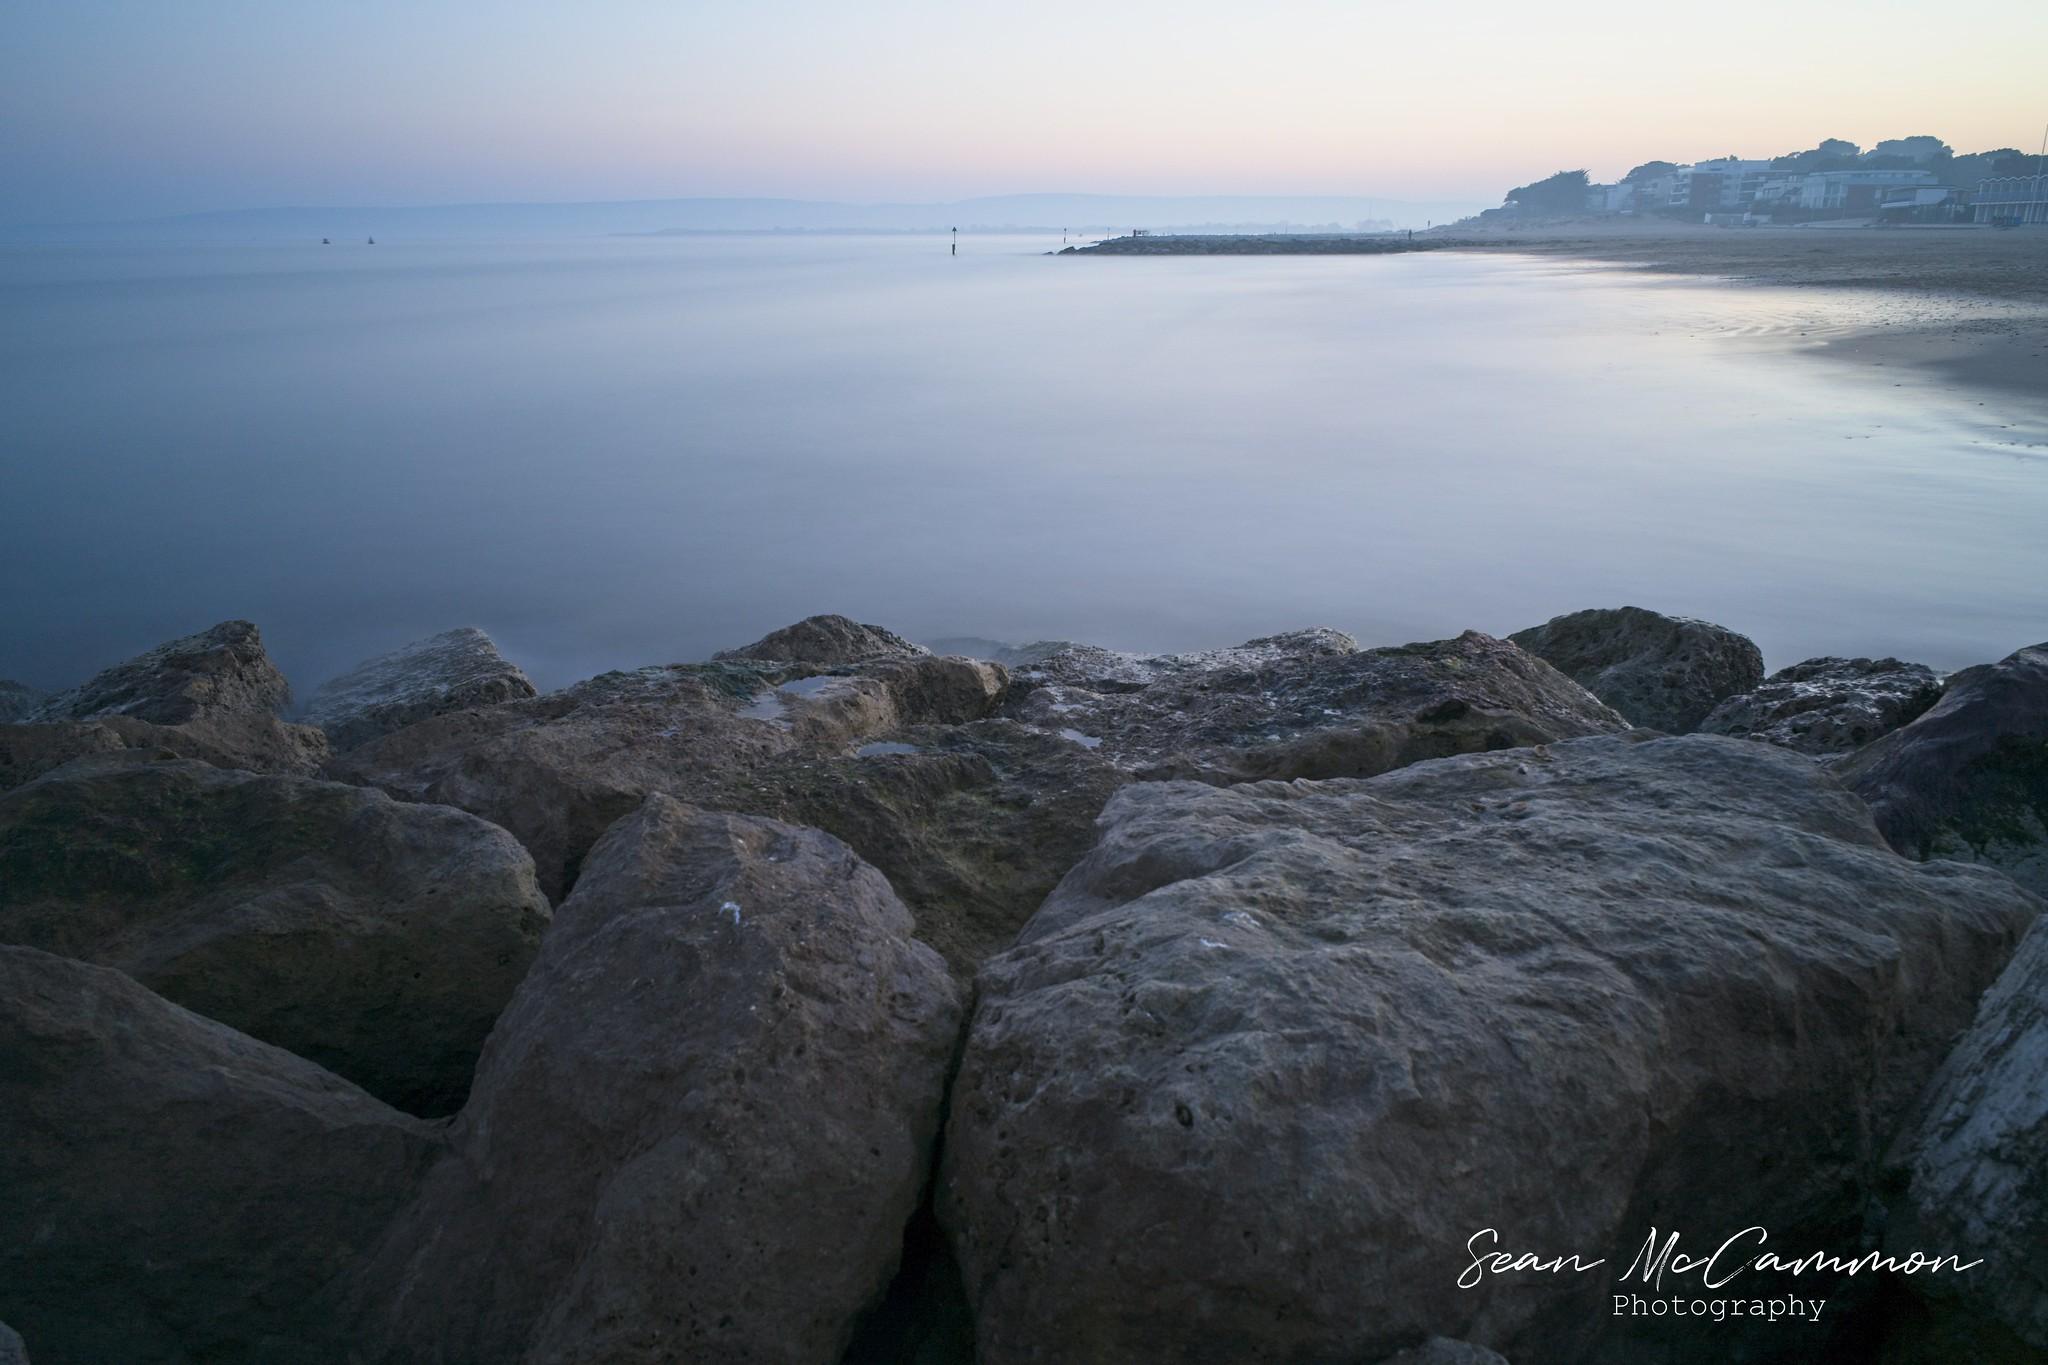 Sandbanks Sea and Rocks